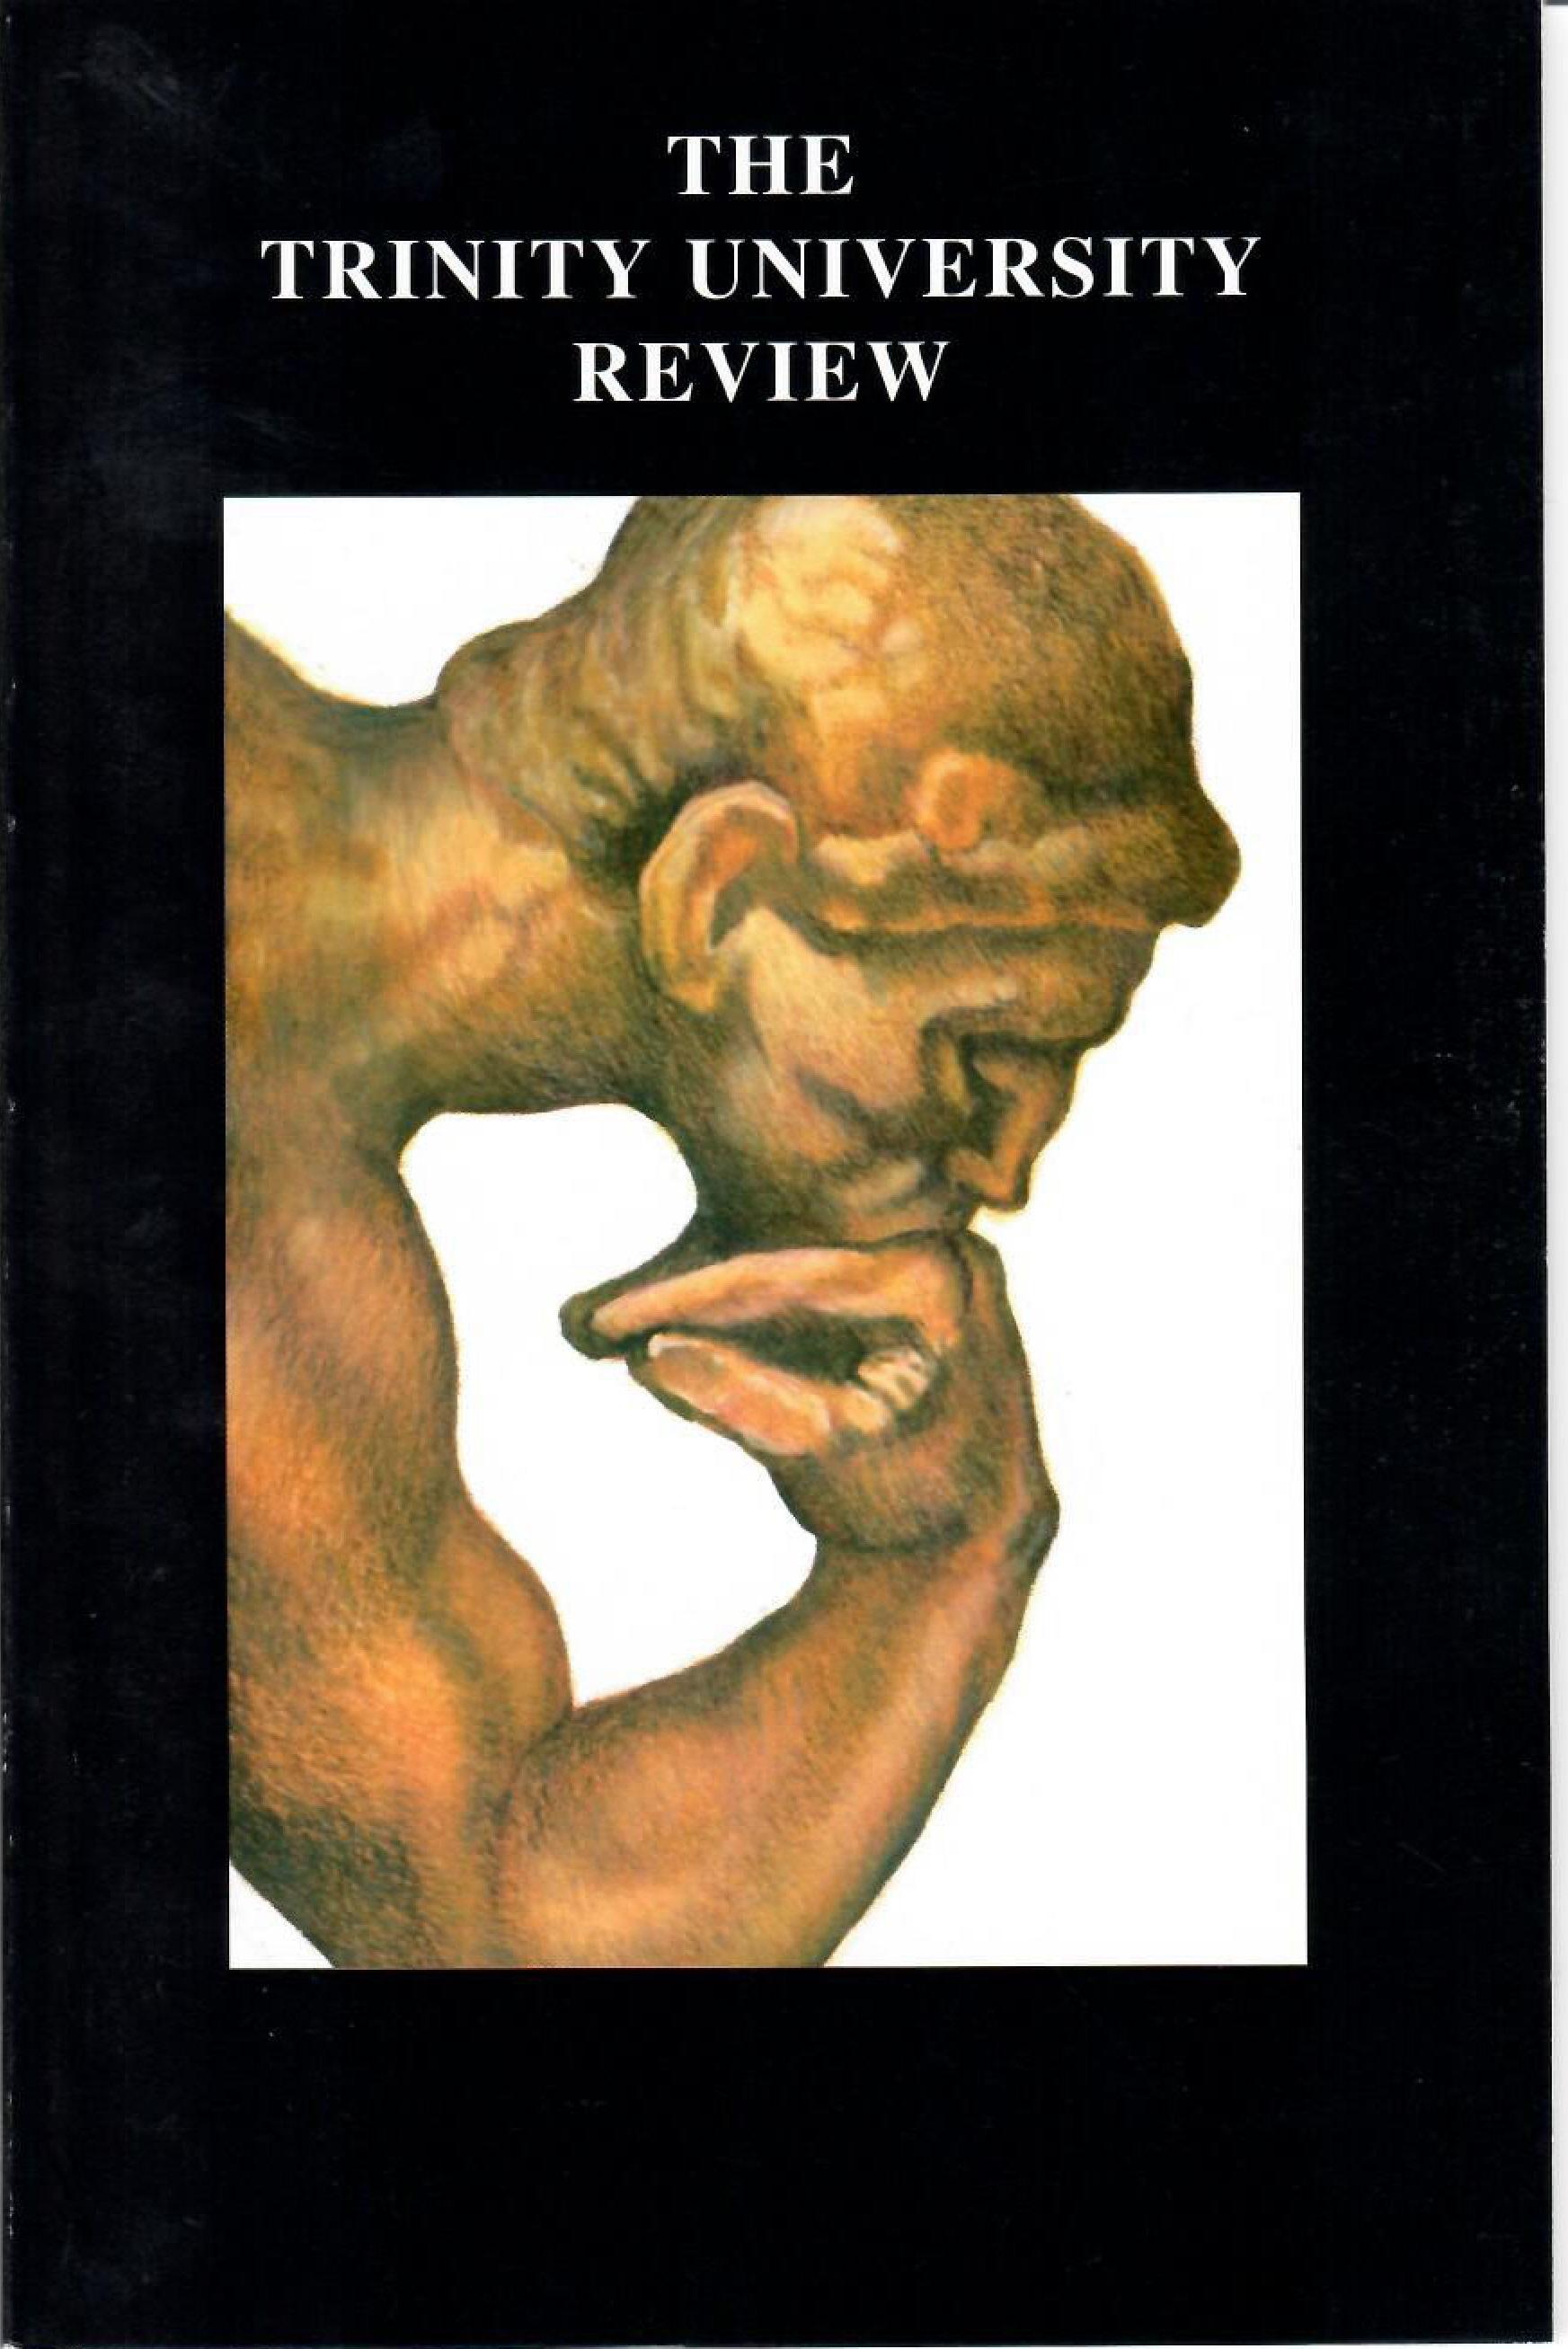 TR109.1 (1996)